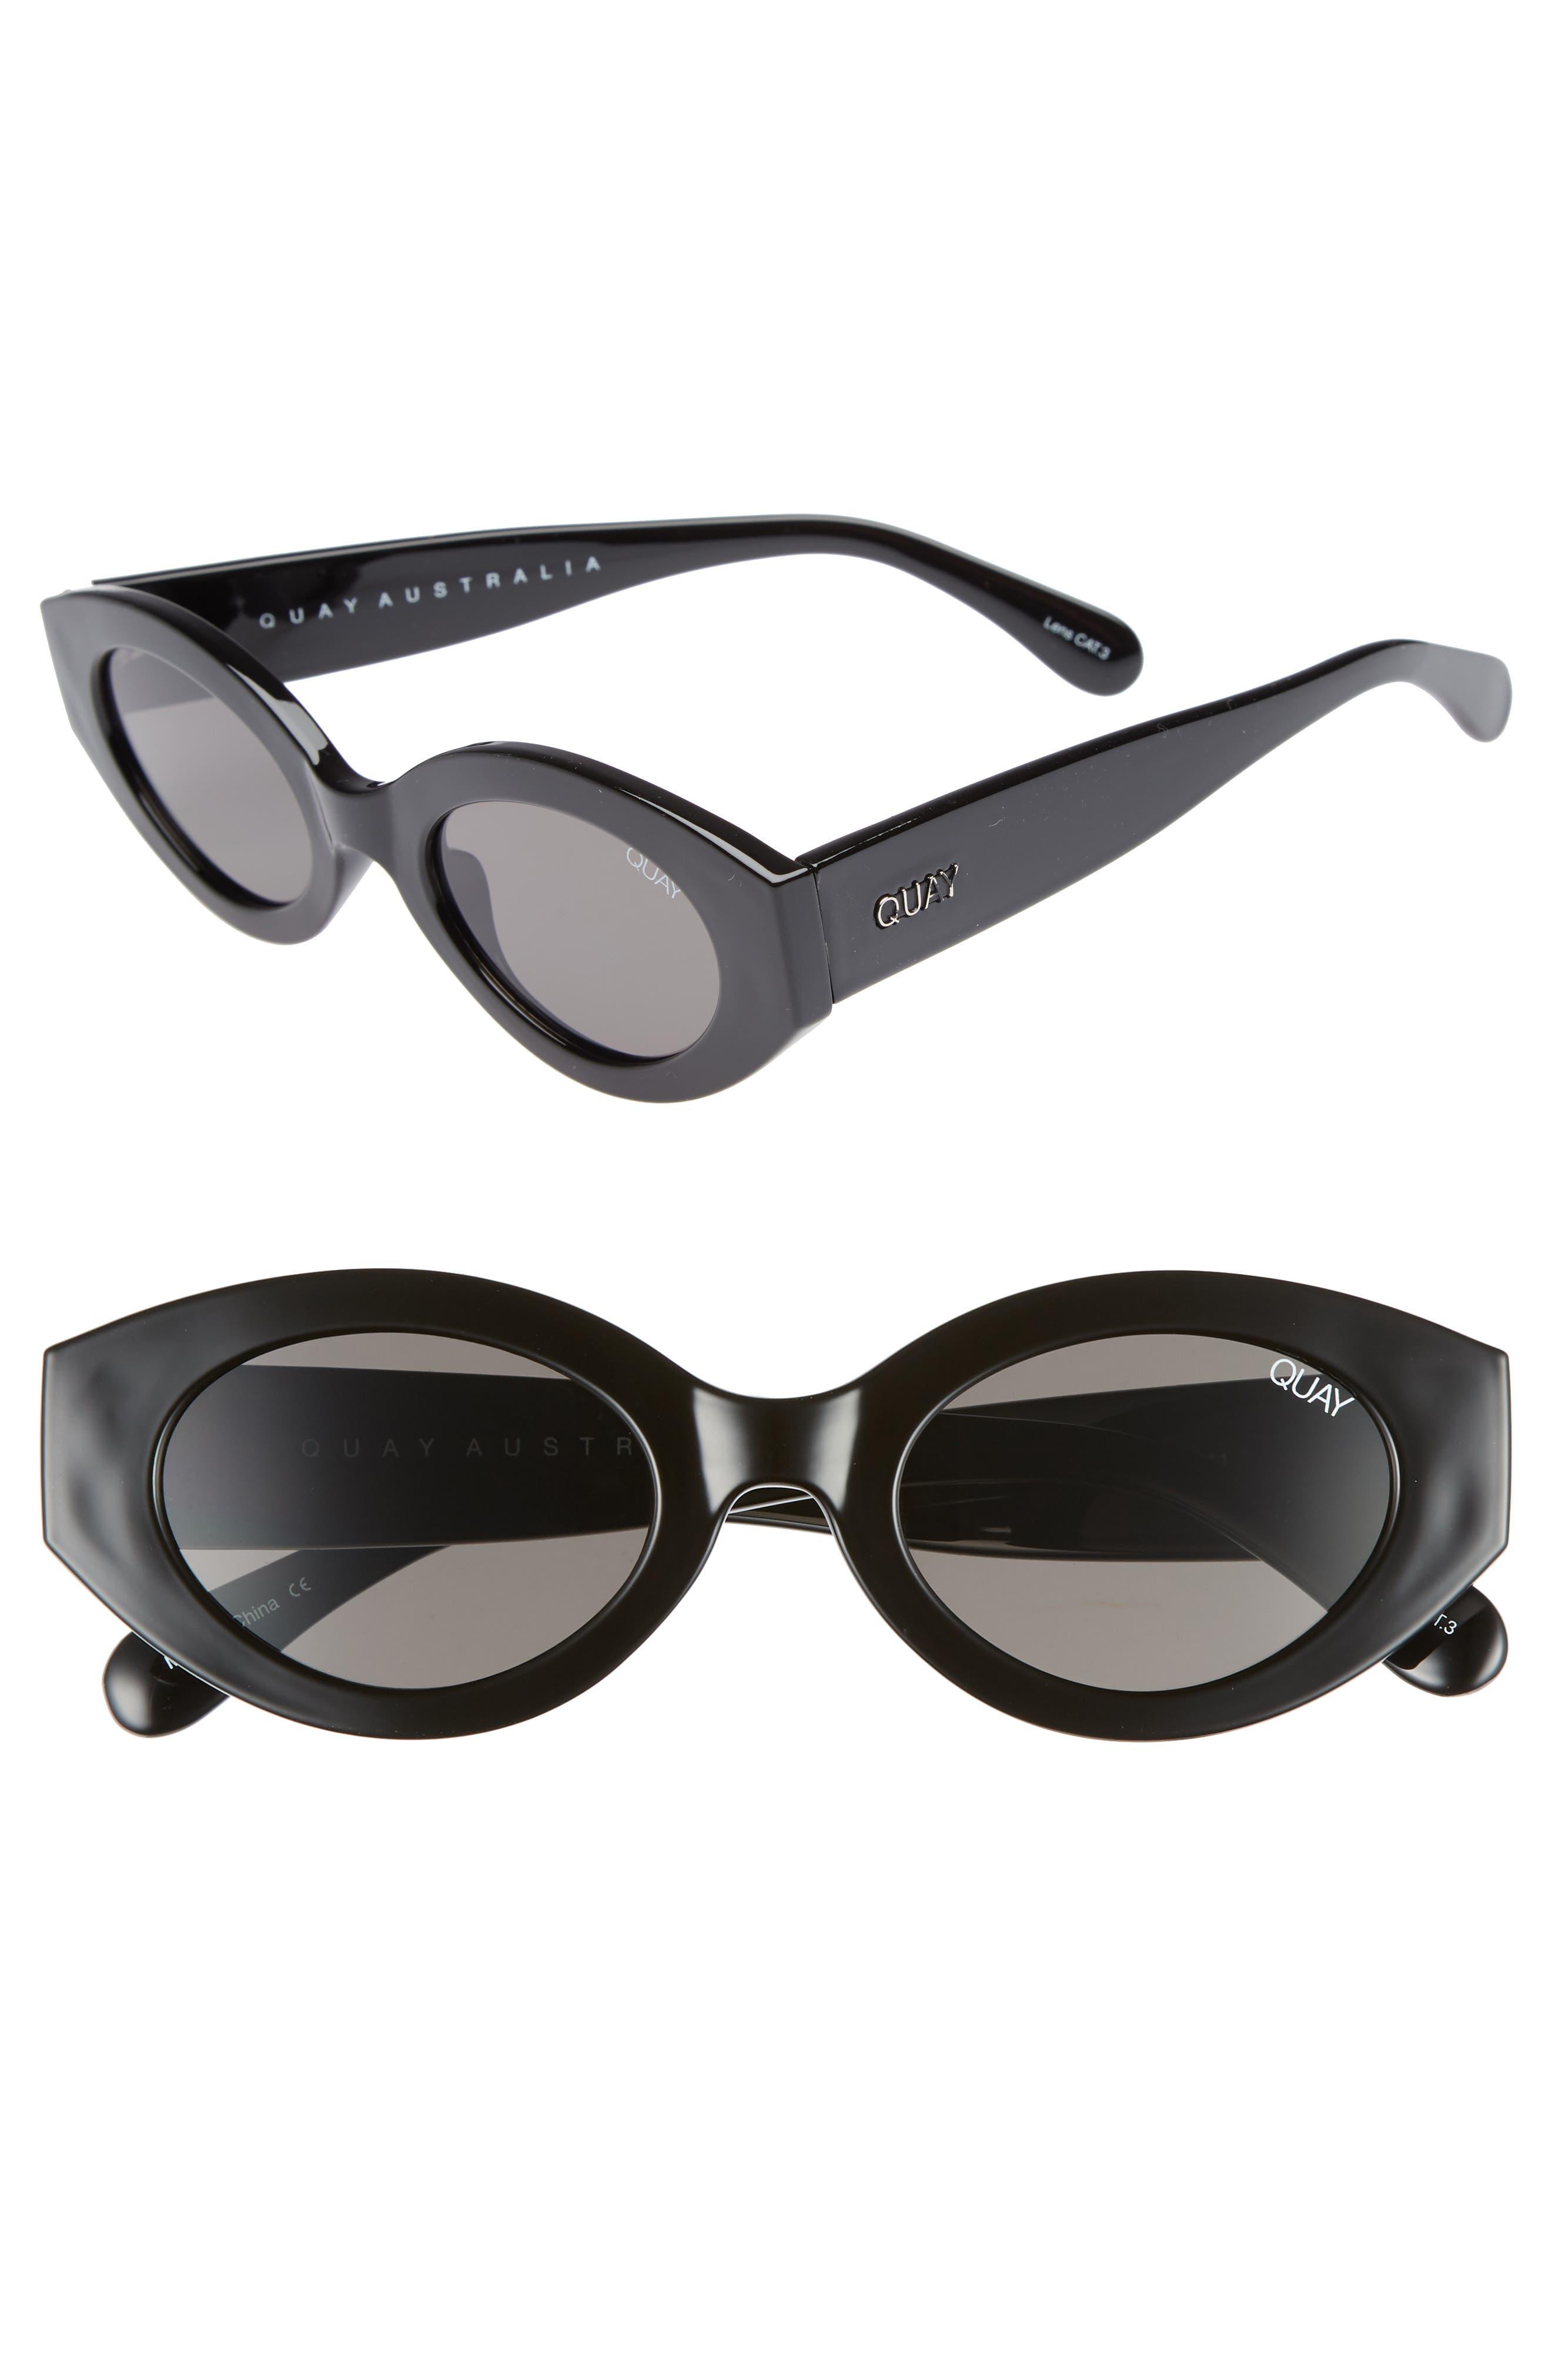 See Me Smile 50mm Cat Eye Sunglasses,                         Main,                         color, Black/ Smoke